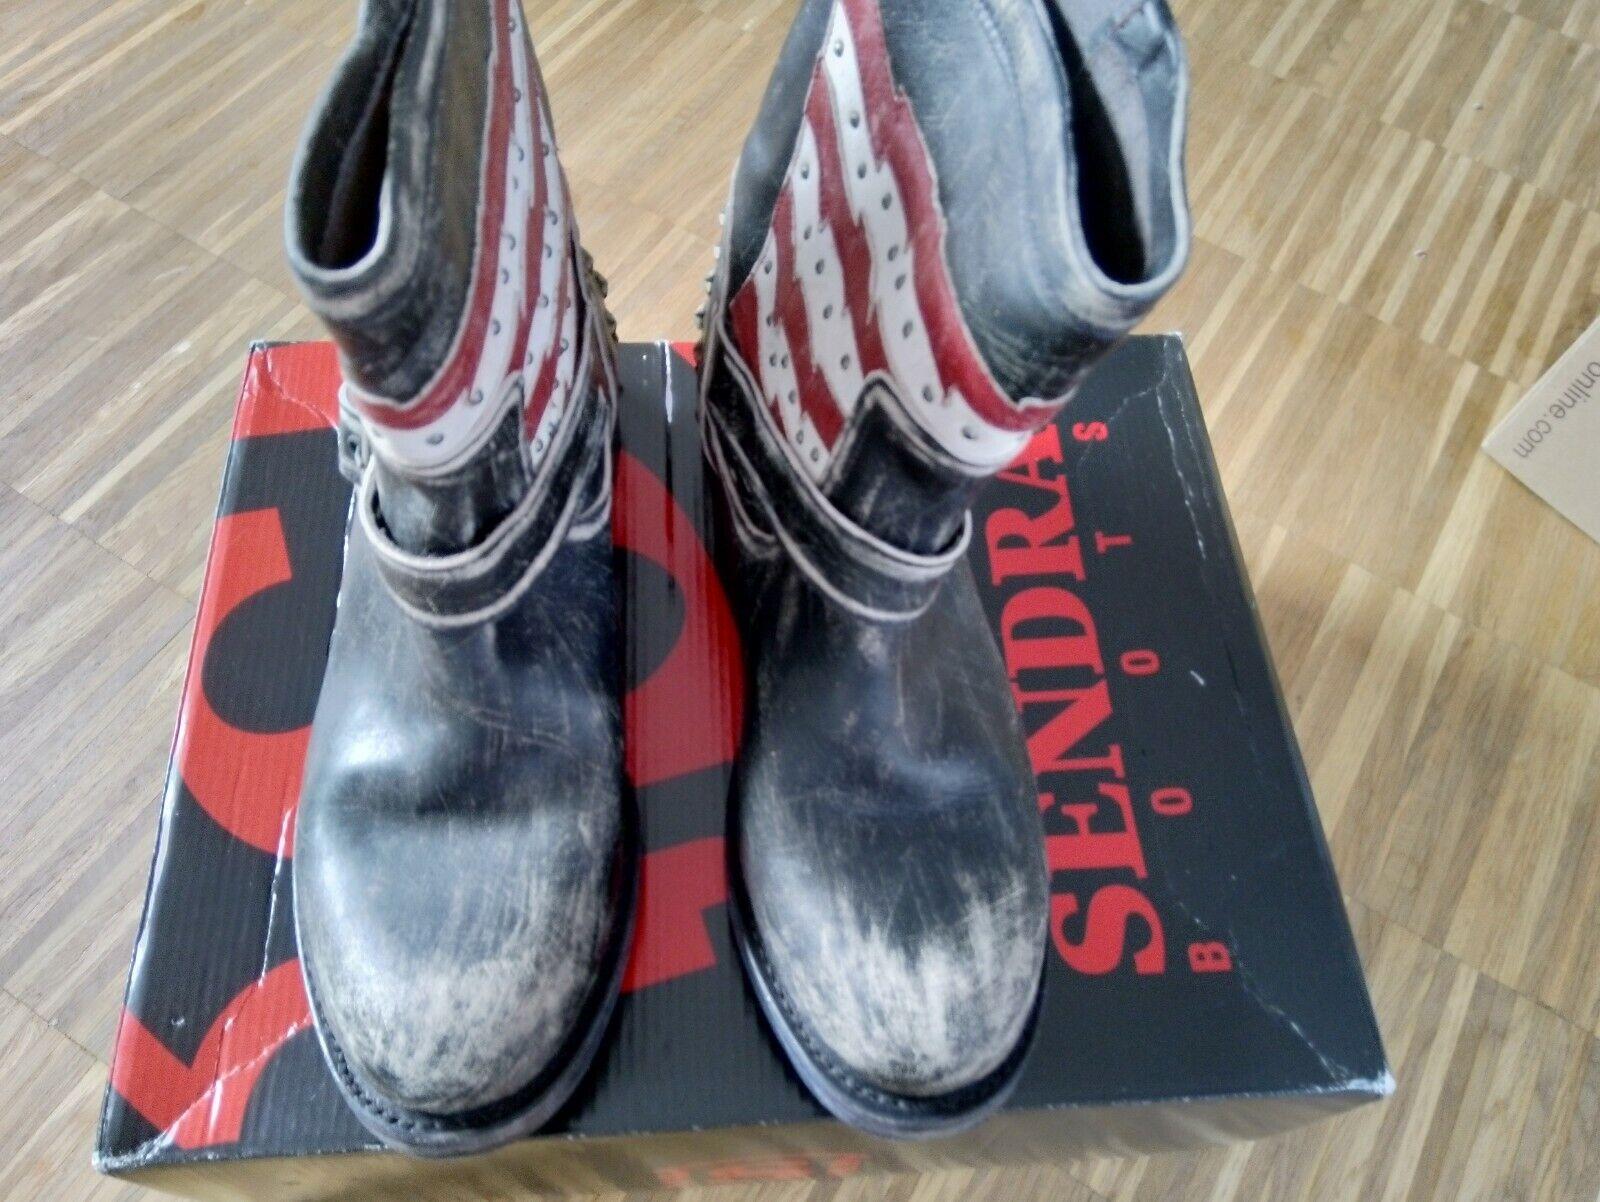 SENDRA Stiefel Leder Nieten Gr.40 41 NP  329 EUR NEU Impressionen Conleys